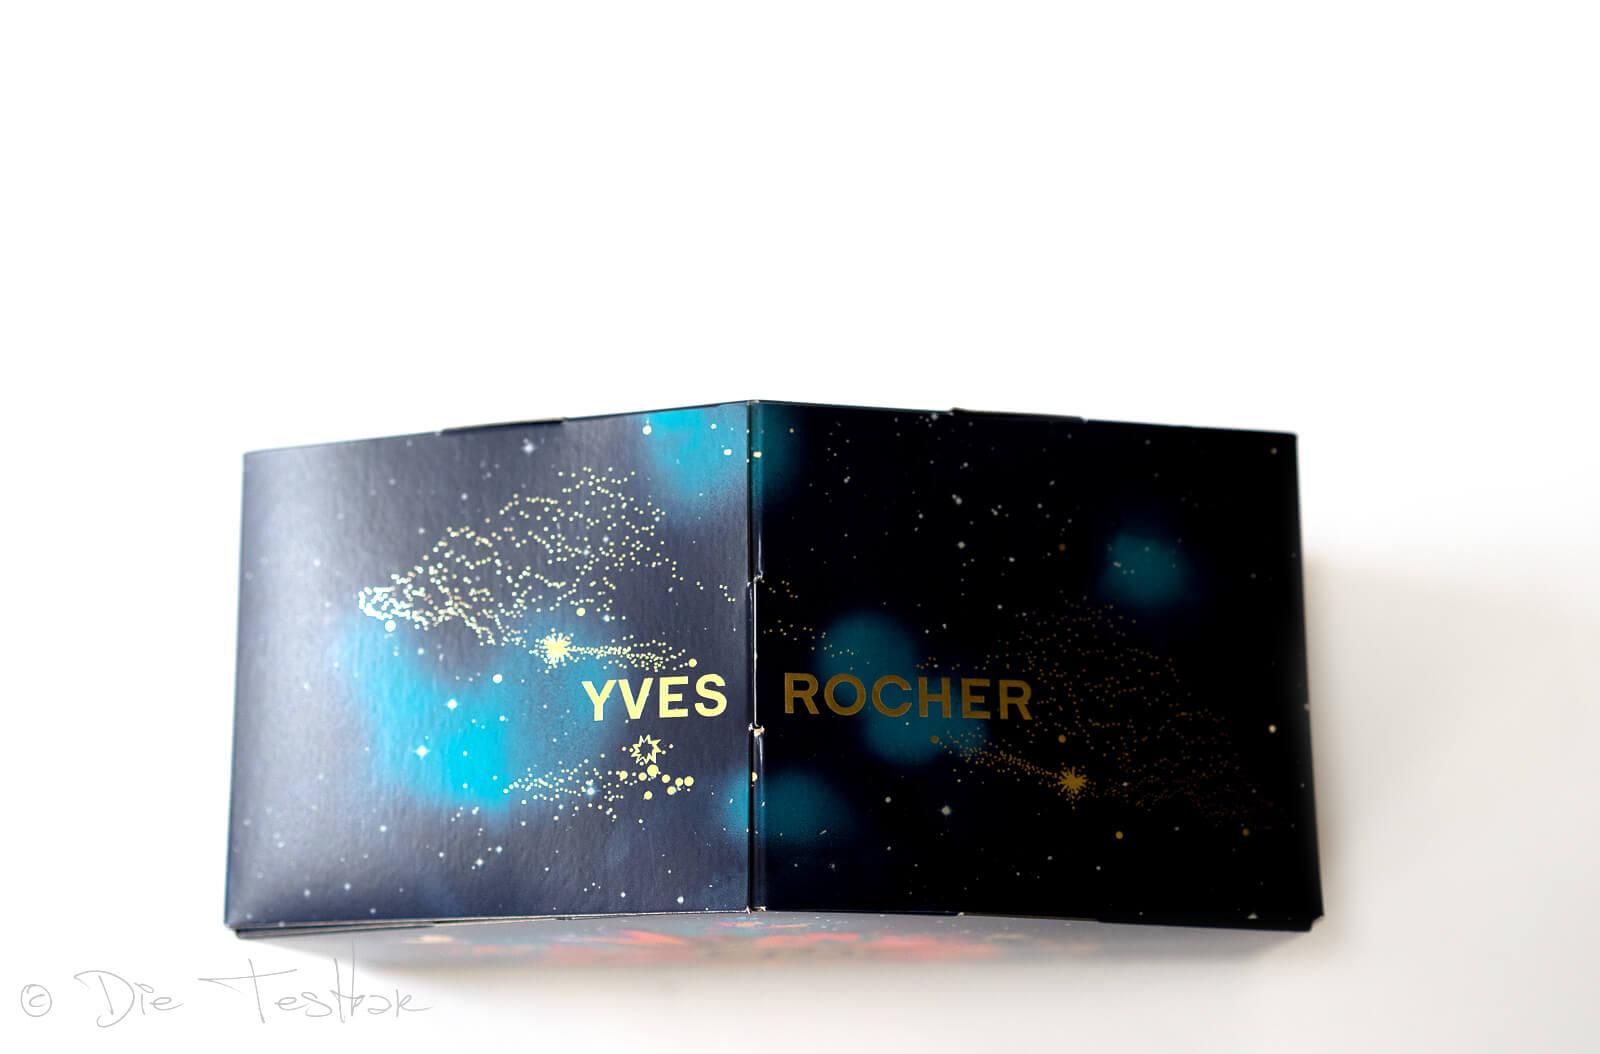 Yves Rocher Adventskalender 2020